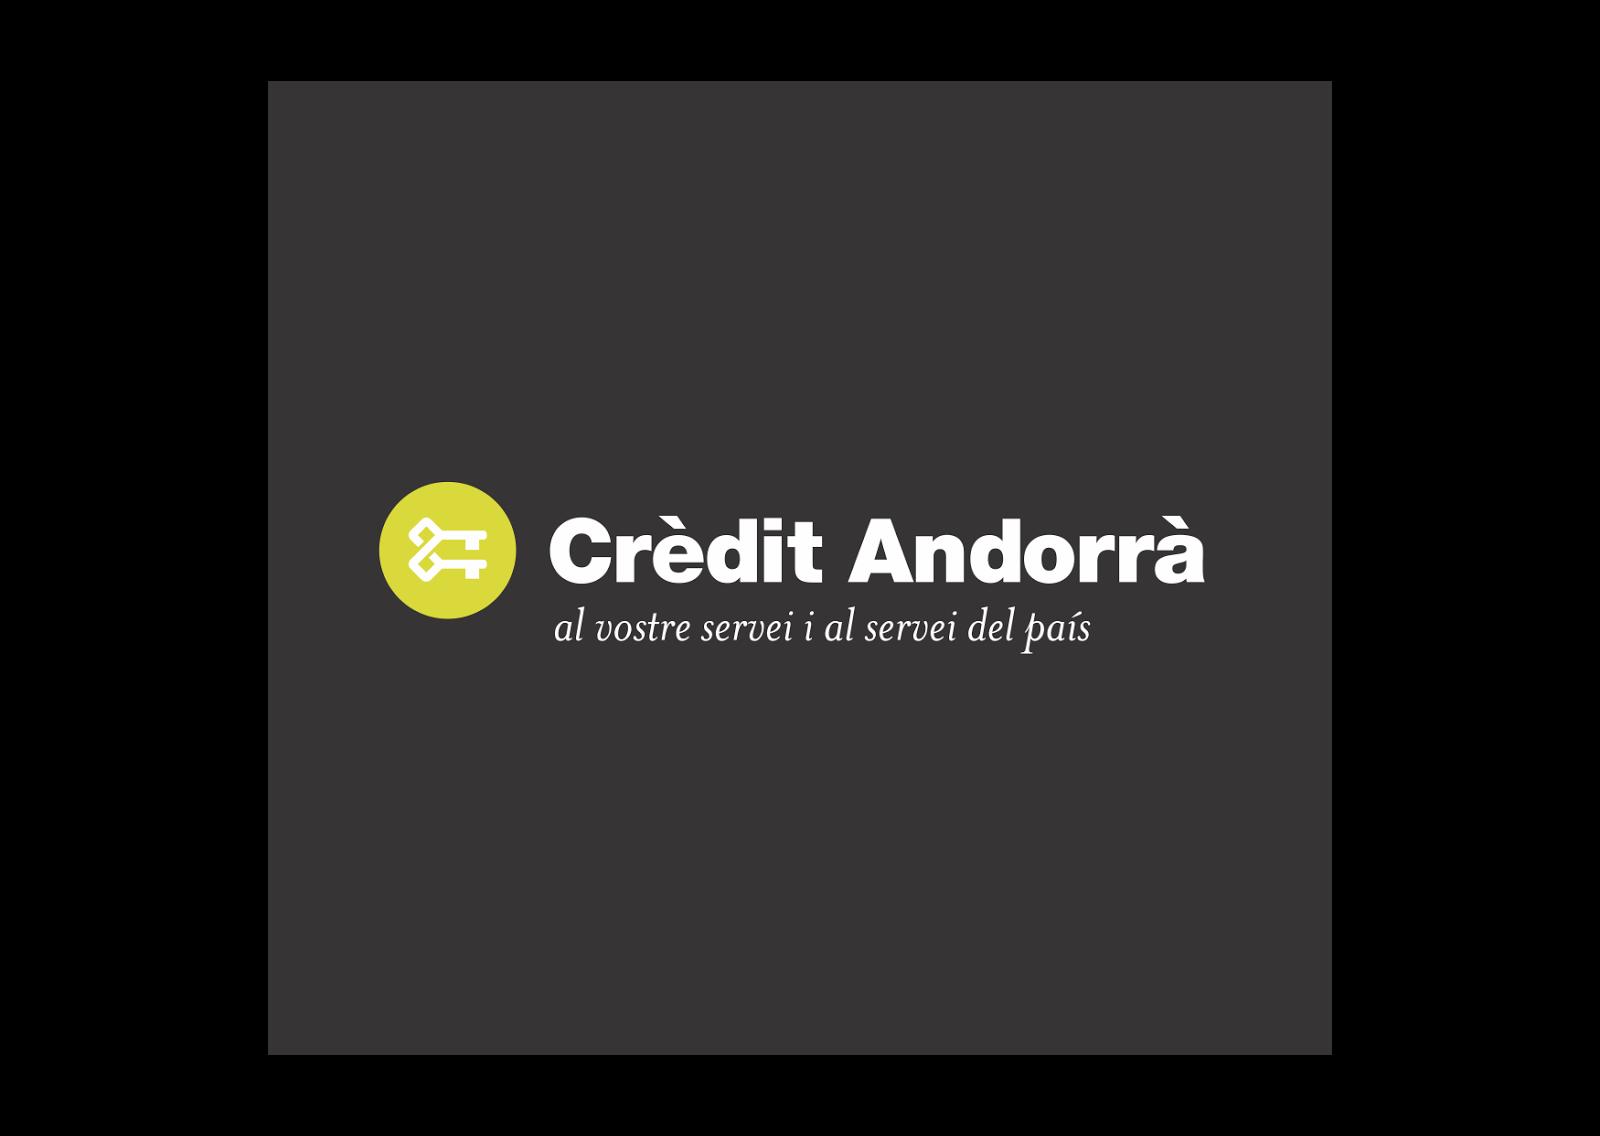 Andorra svg #2, Download drawings